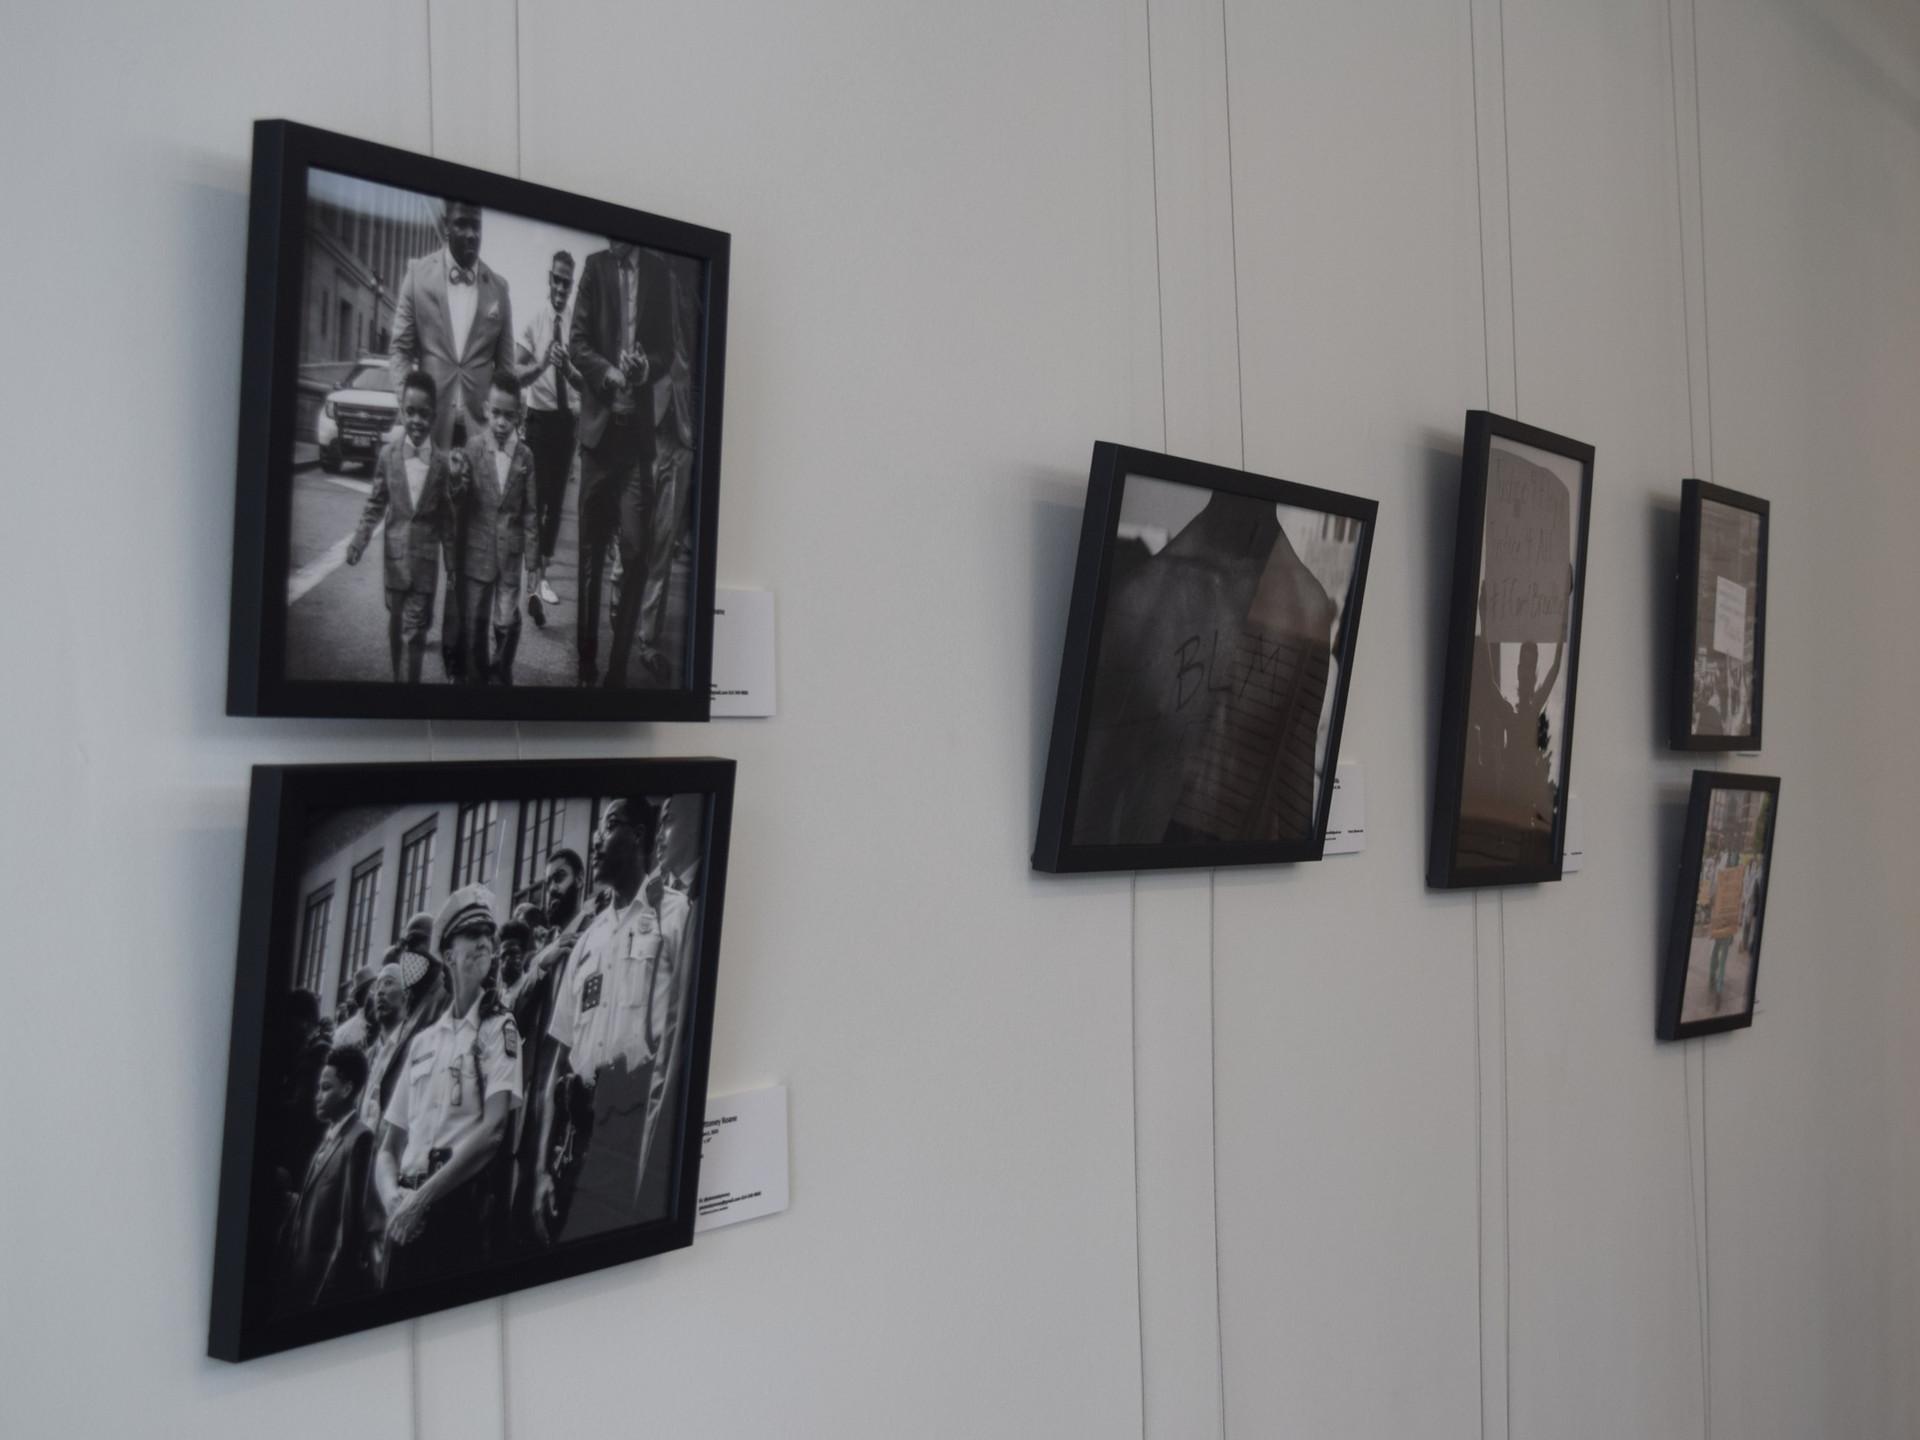 #ArtUnites Cbus Film & Photography Exhibition